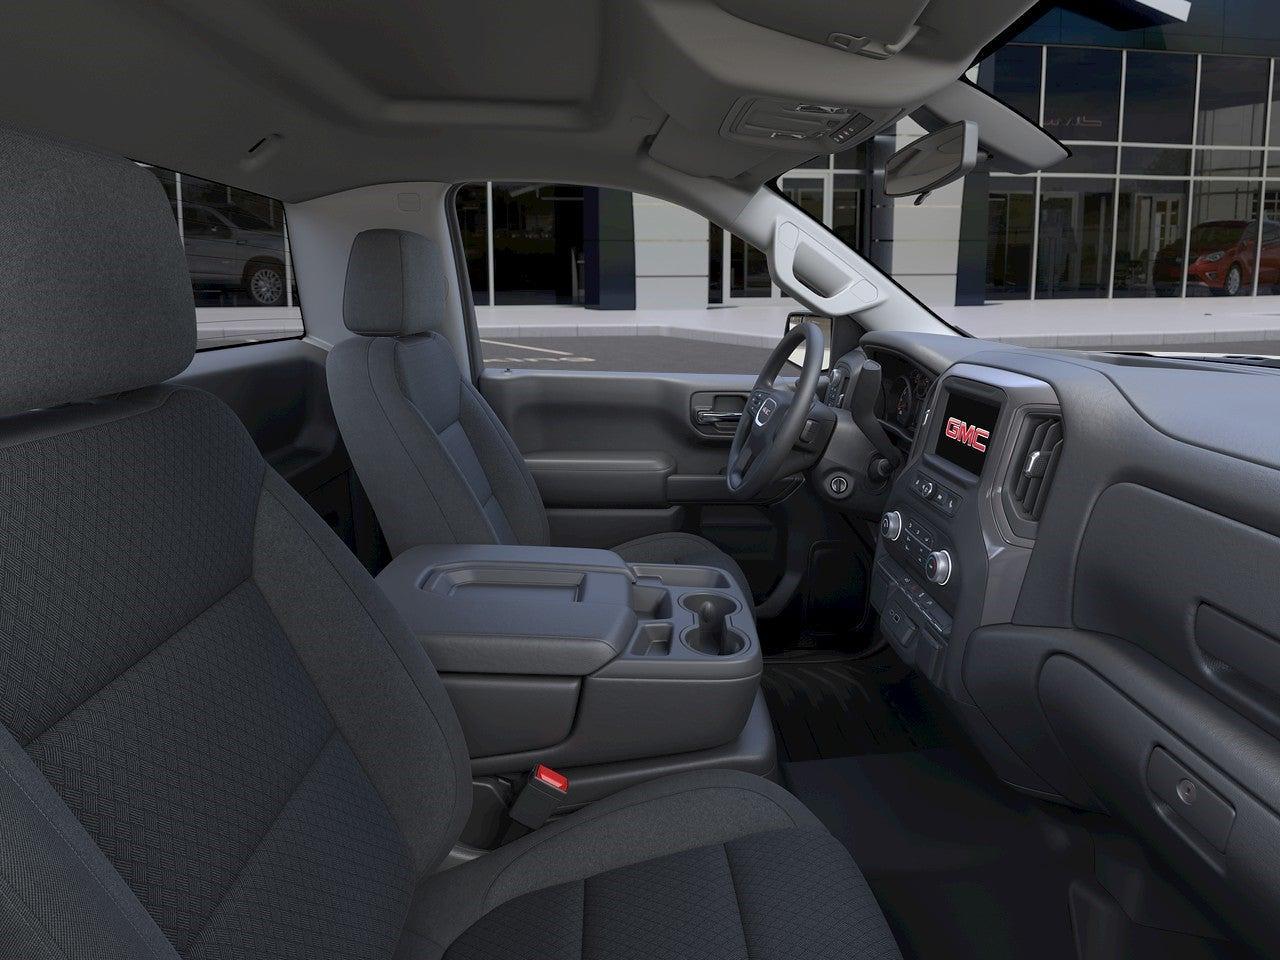 2021 GMC Sierra 1500 Regular Cab 4x4, Pickup #V21207 - photo 34